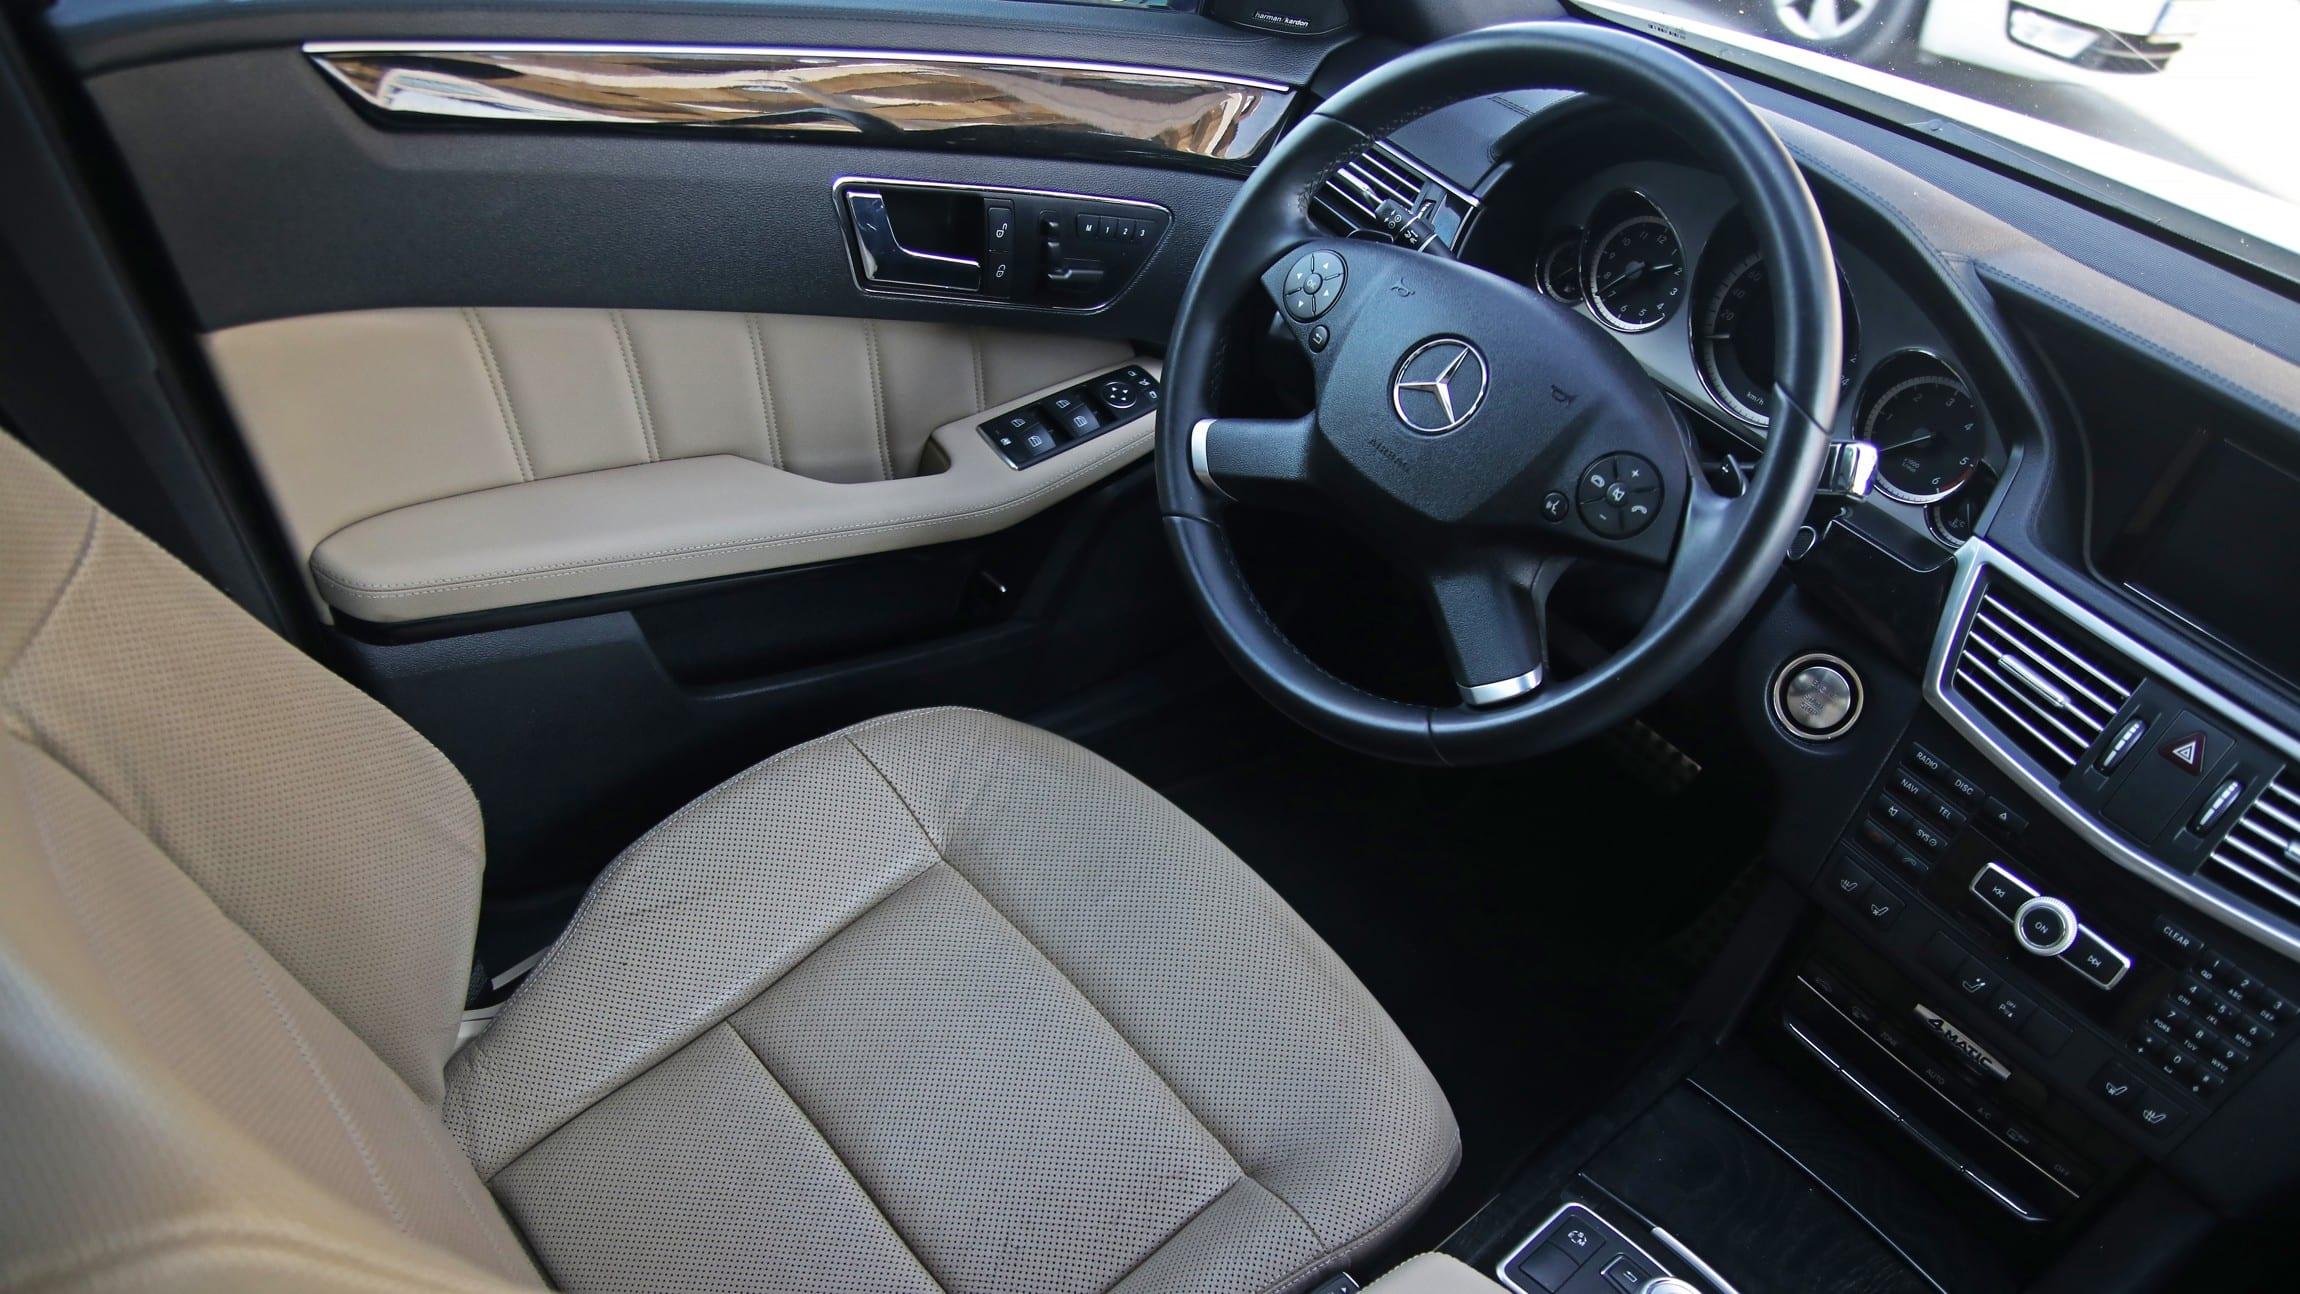 Mercedes-Benz E 350 CDI W212 Brabus interiér